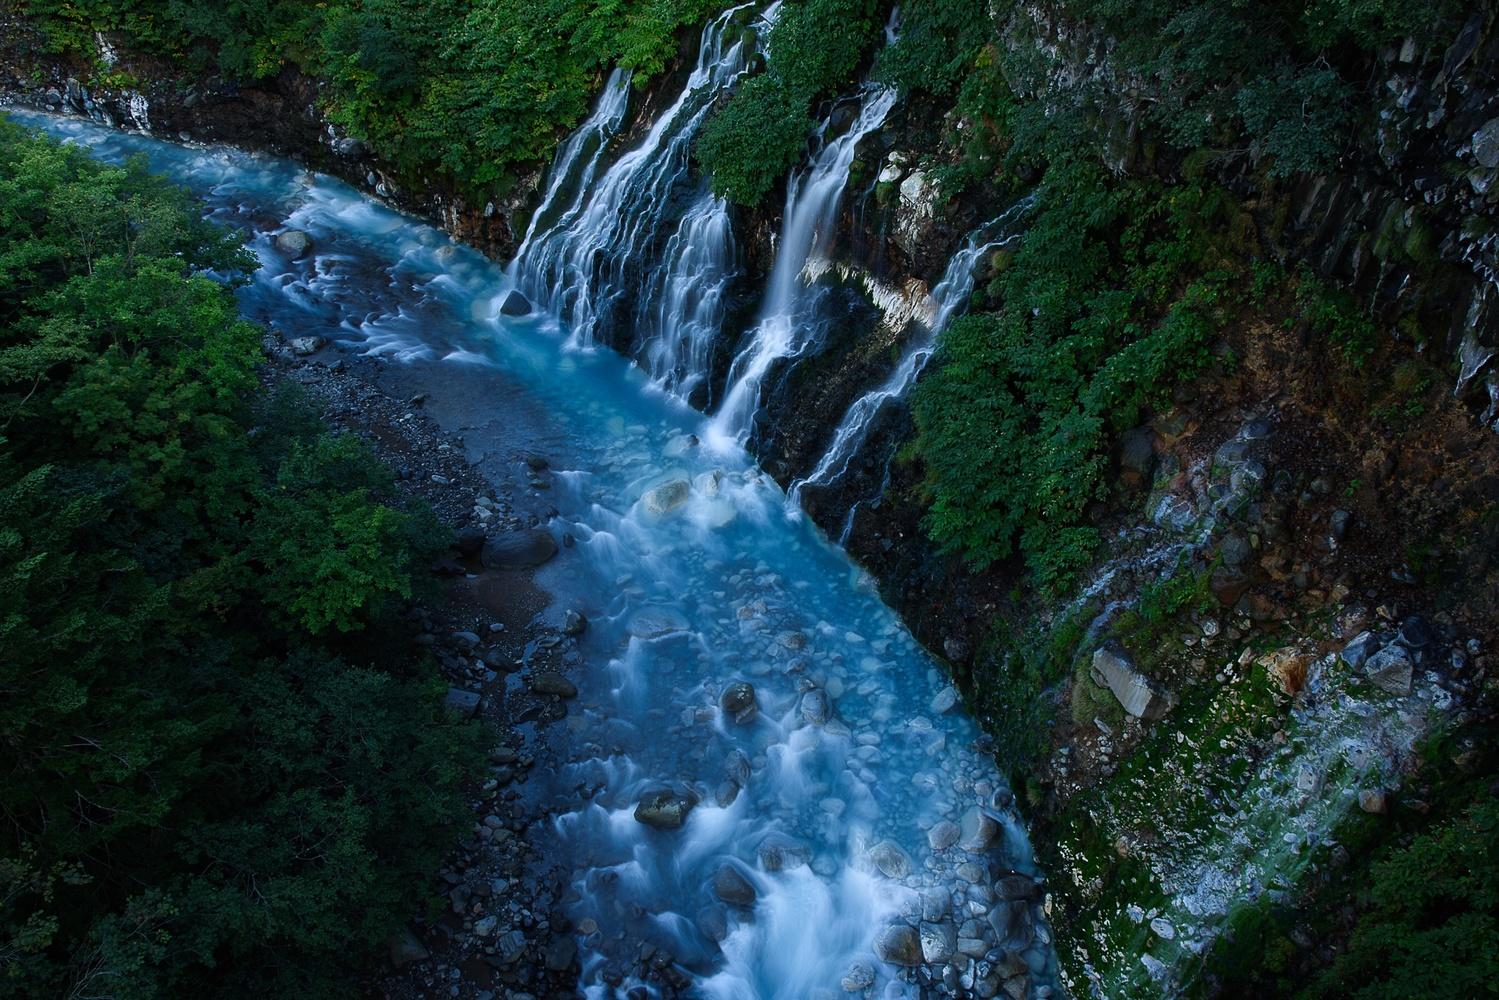 Shirahige waterfall by Masataka Inada